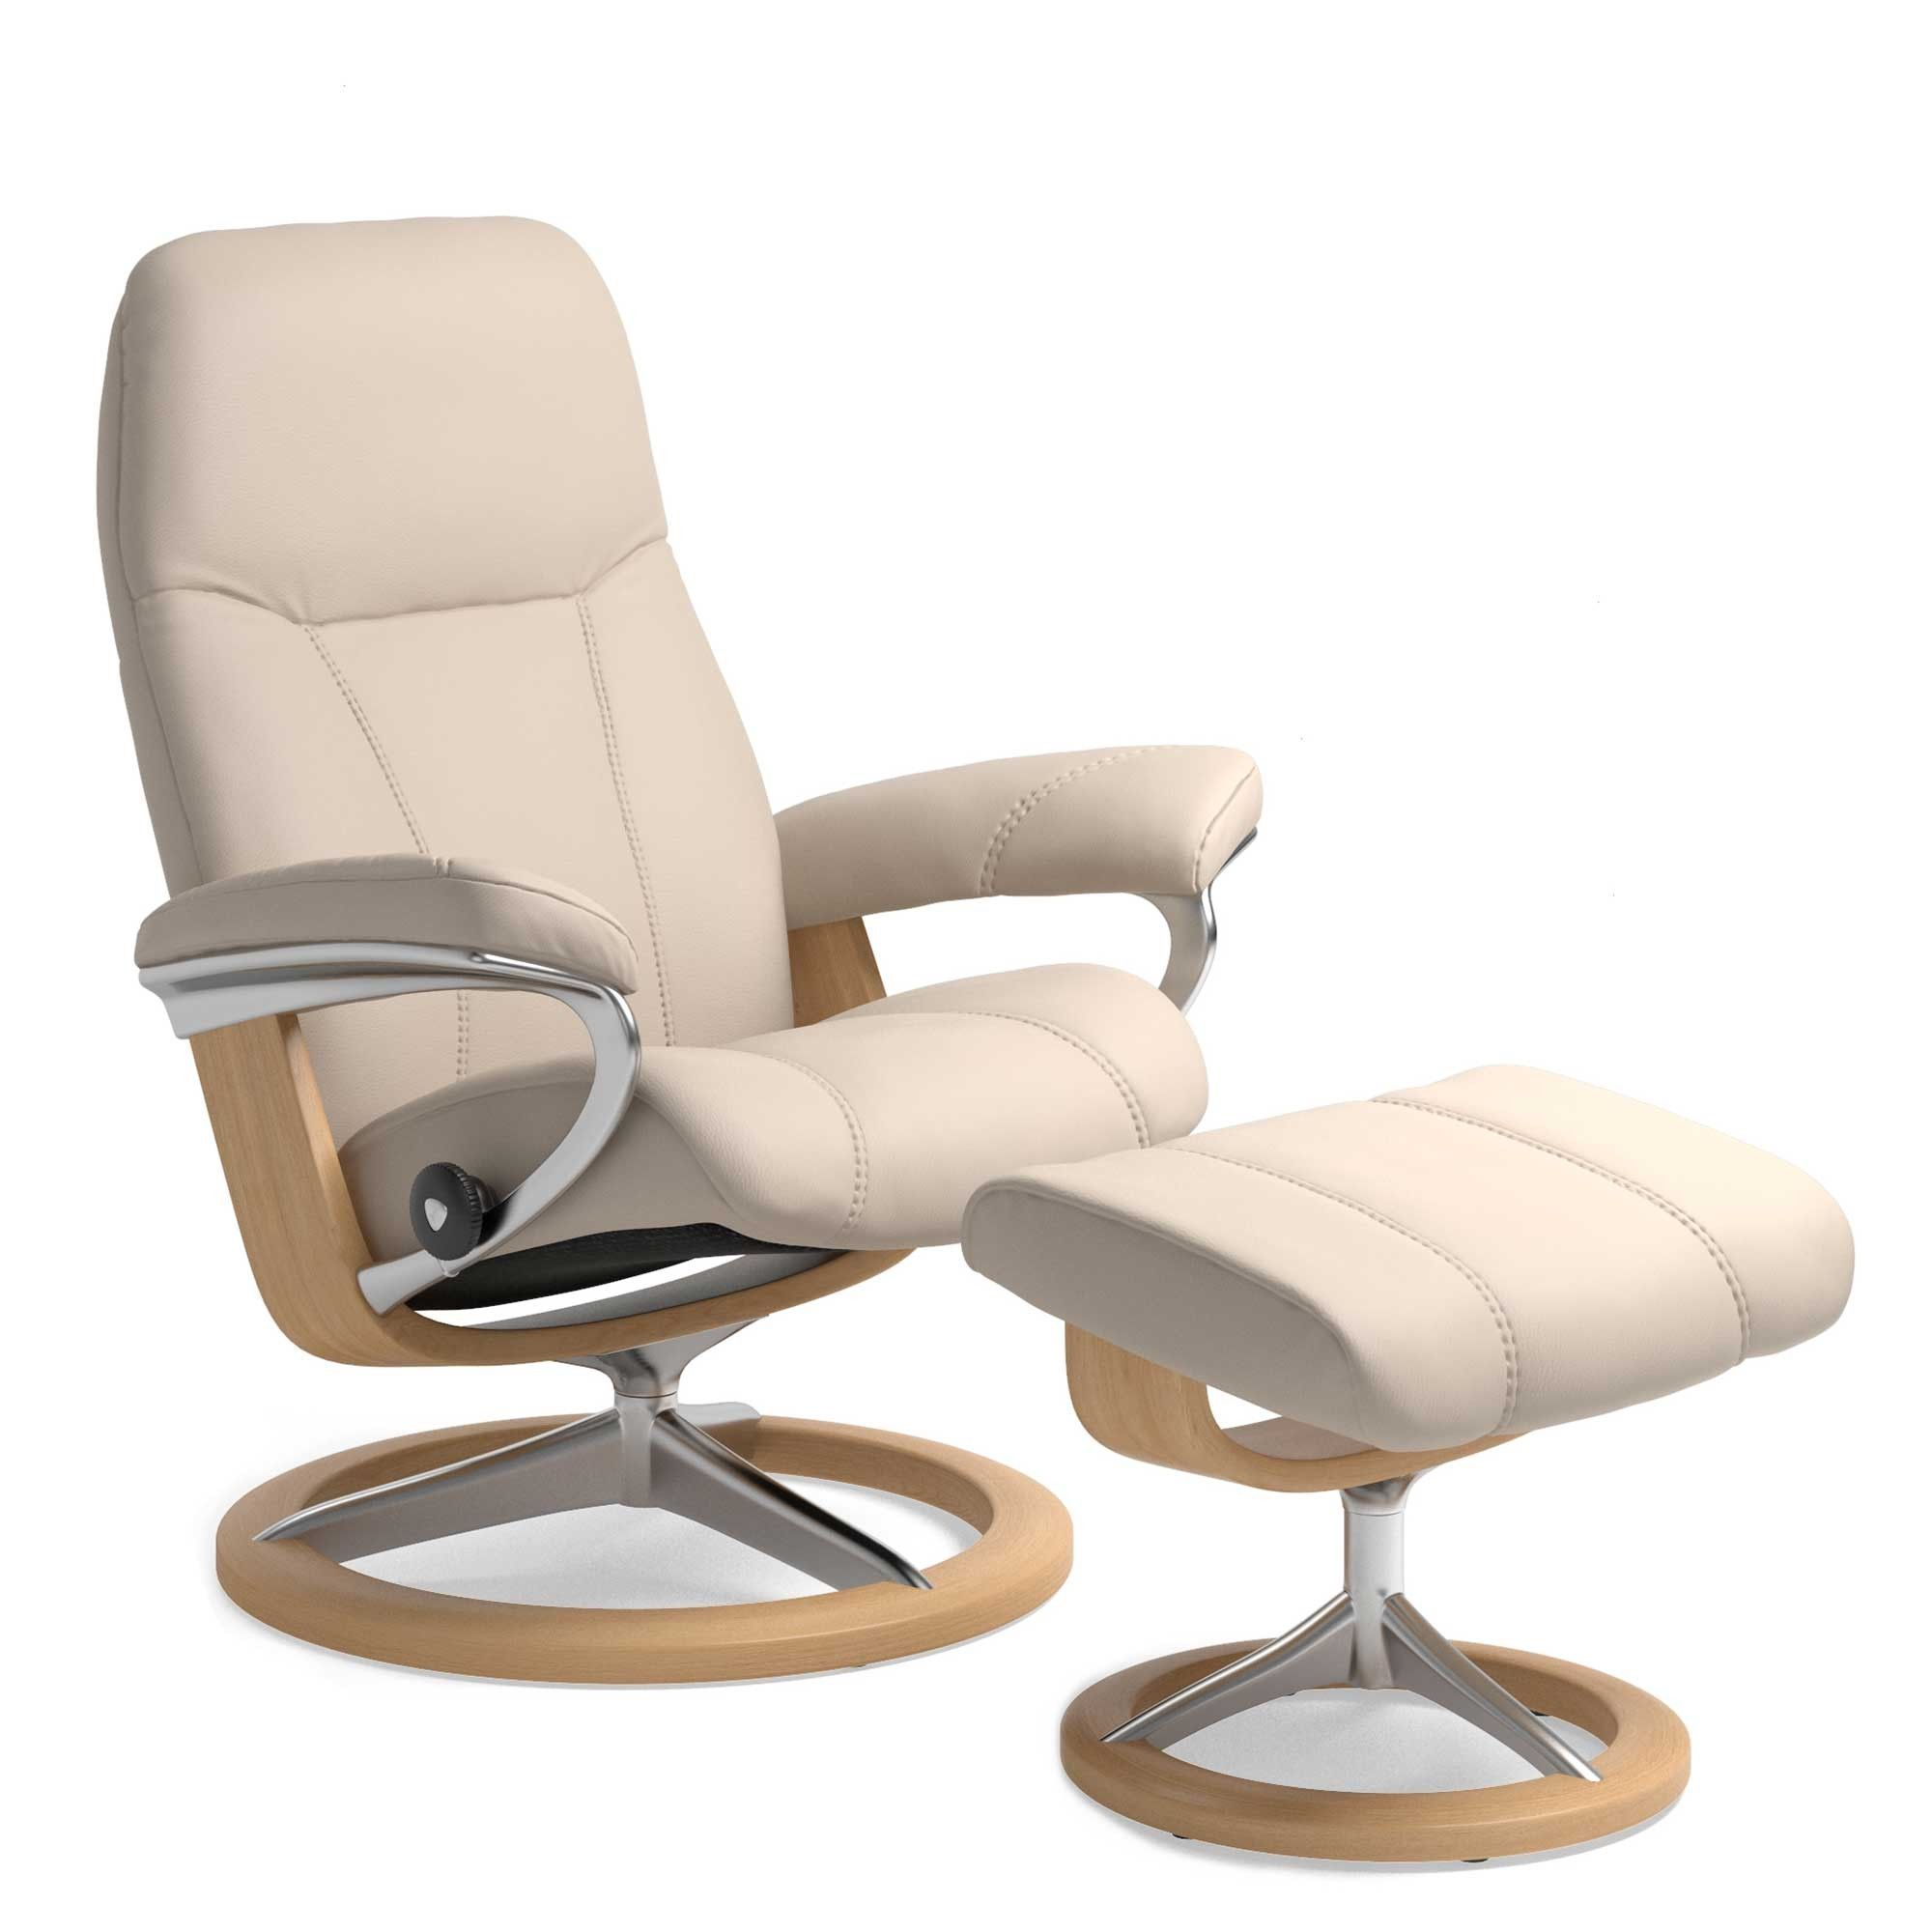 Stressless Consul Medium Chair & Stool Signature Base